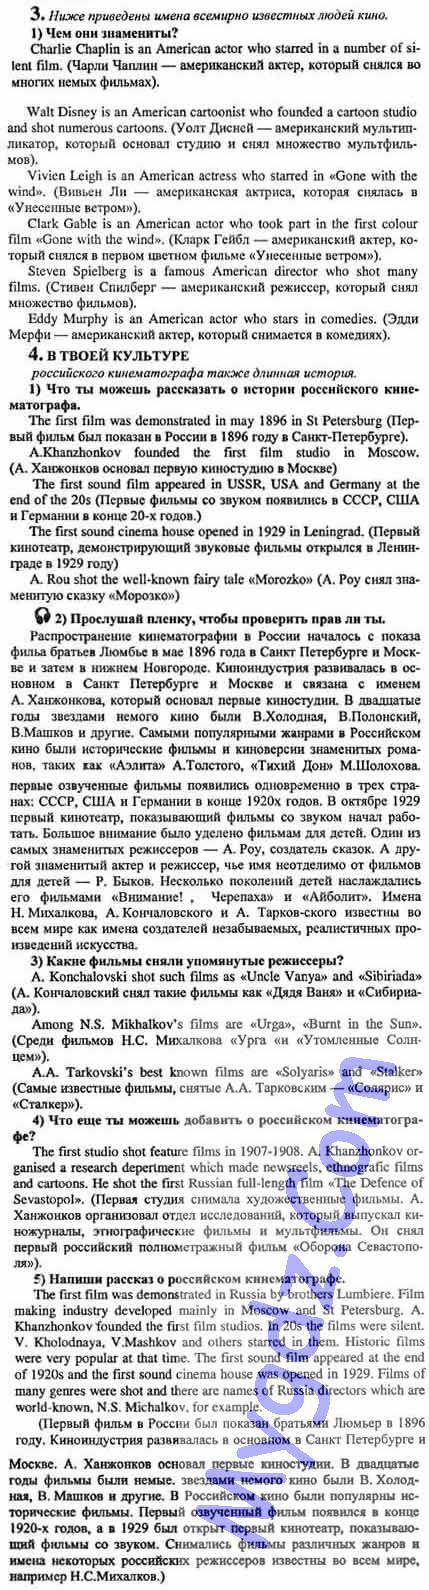 гдз к задачнику по химии 9 класс н.е.кузнецова